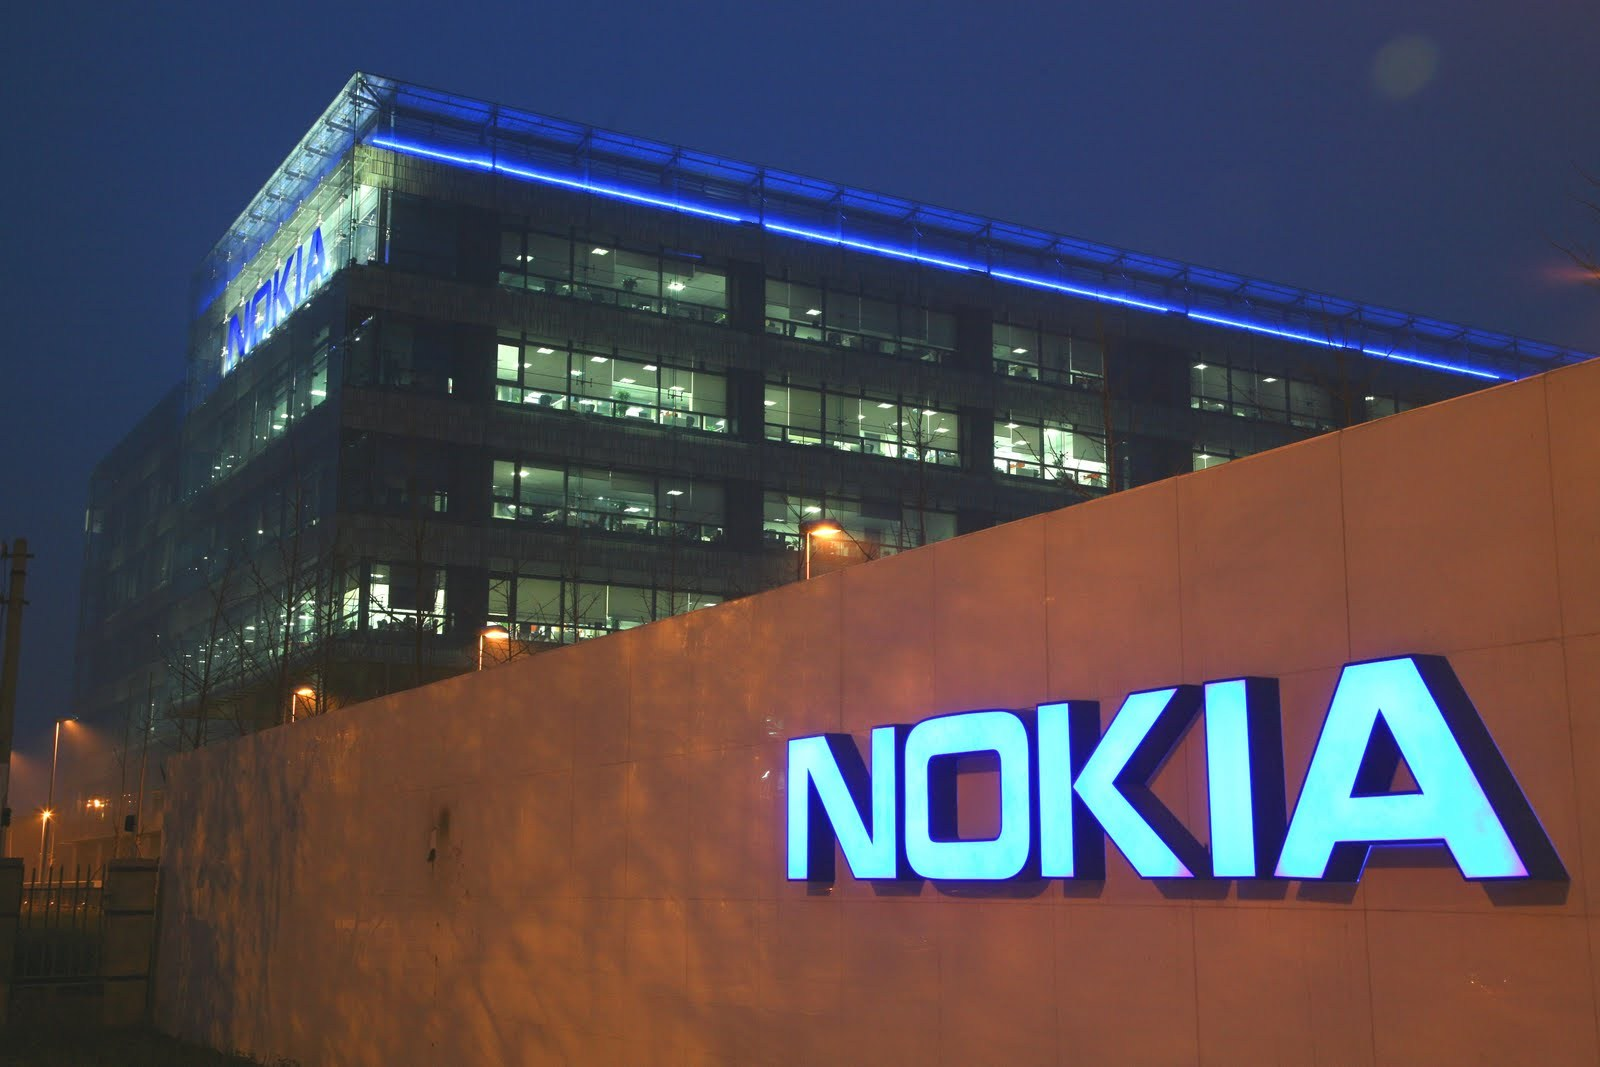 Nokia veut supprimer 597 emplois en France